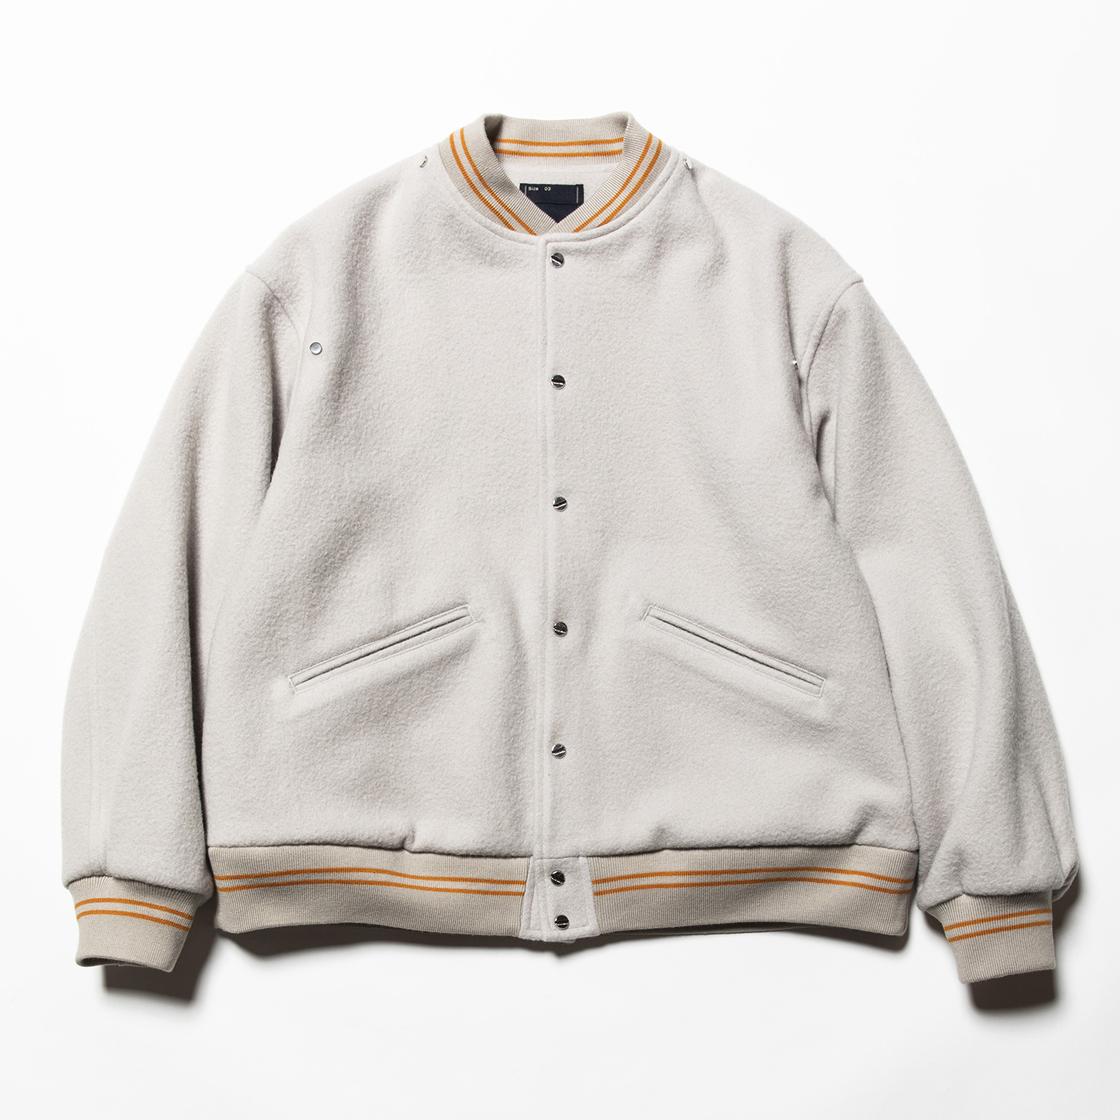 Retro Fleece Melton Varsity Jackets G.White